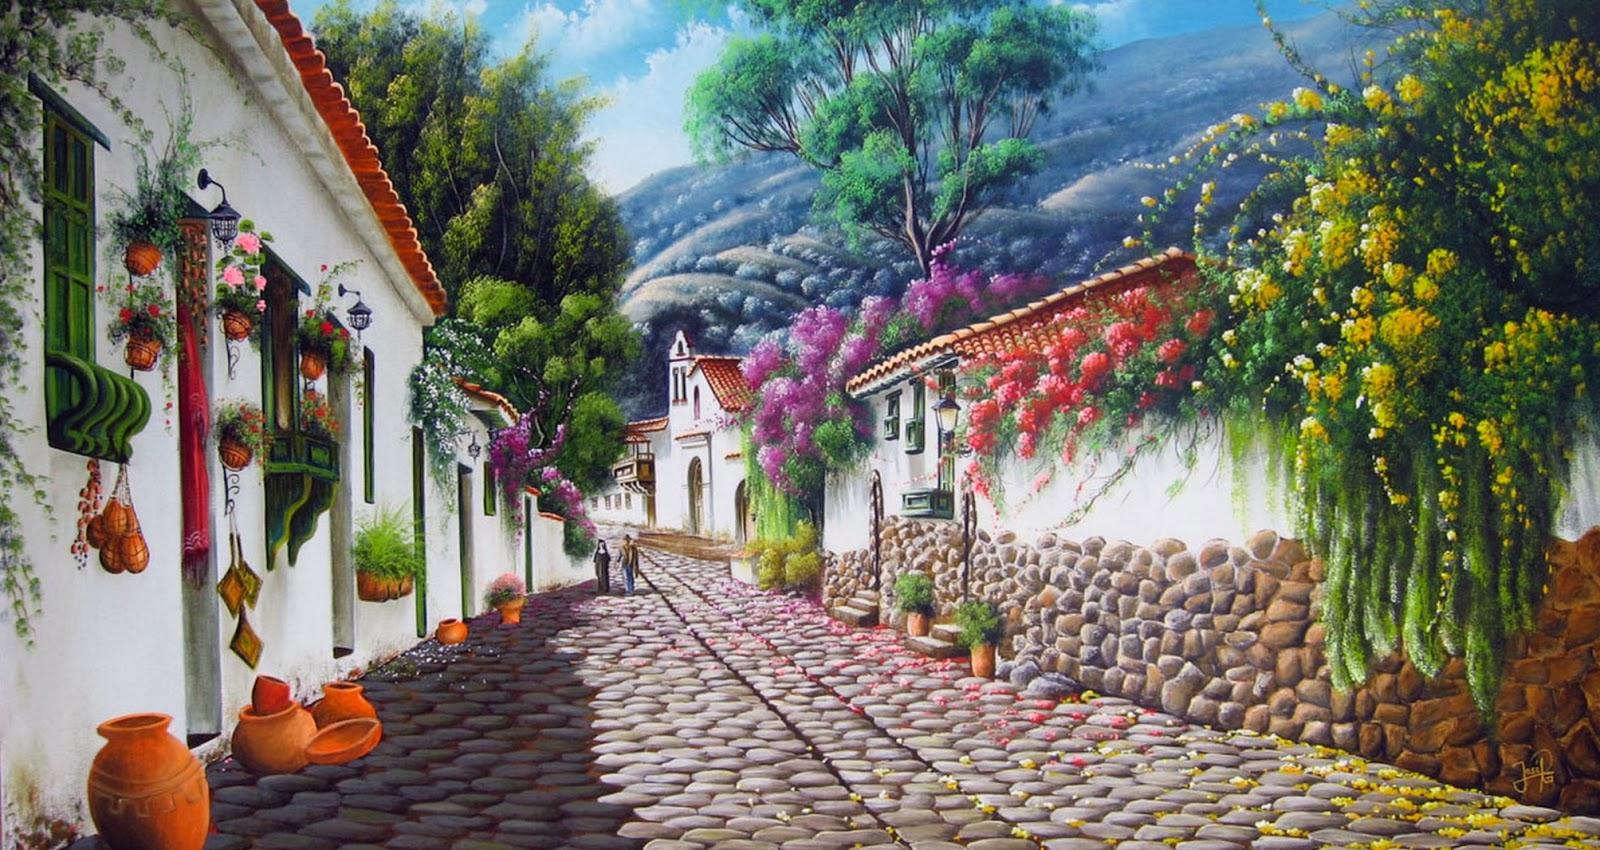 Pintura moderna y fotograf a art stica pintores de paisajes colombianos paisajes costumbristas - Pintores en cartagena ...